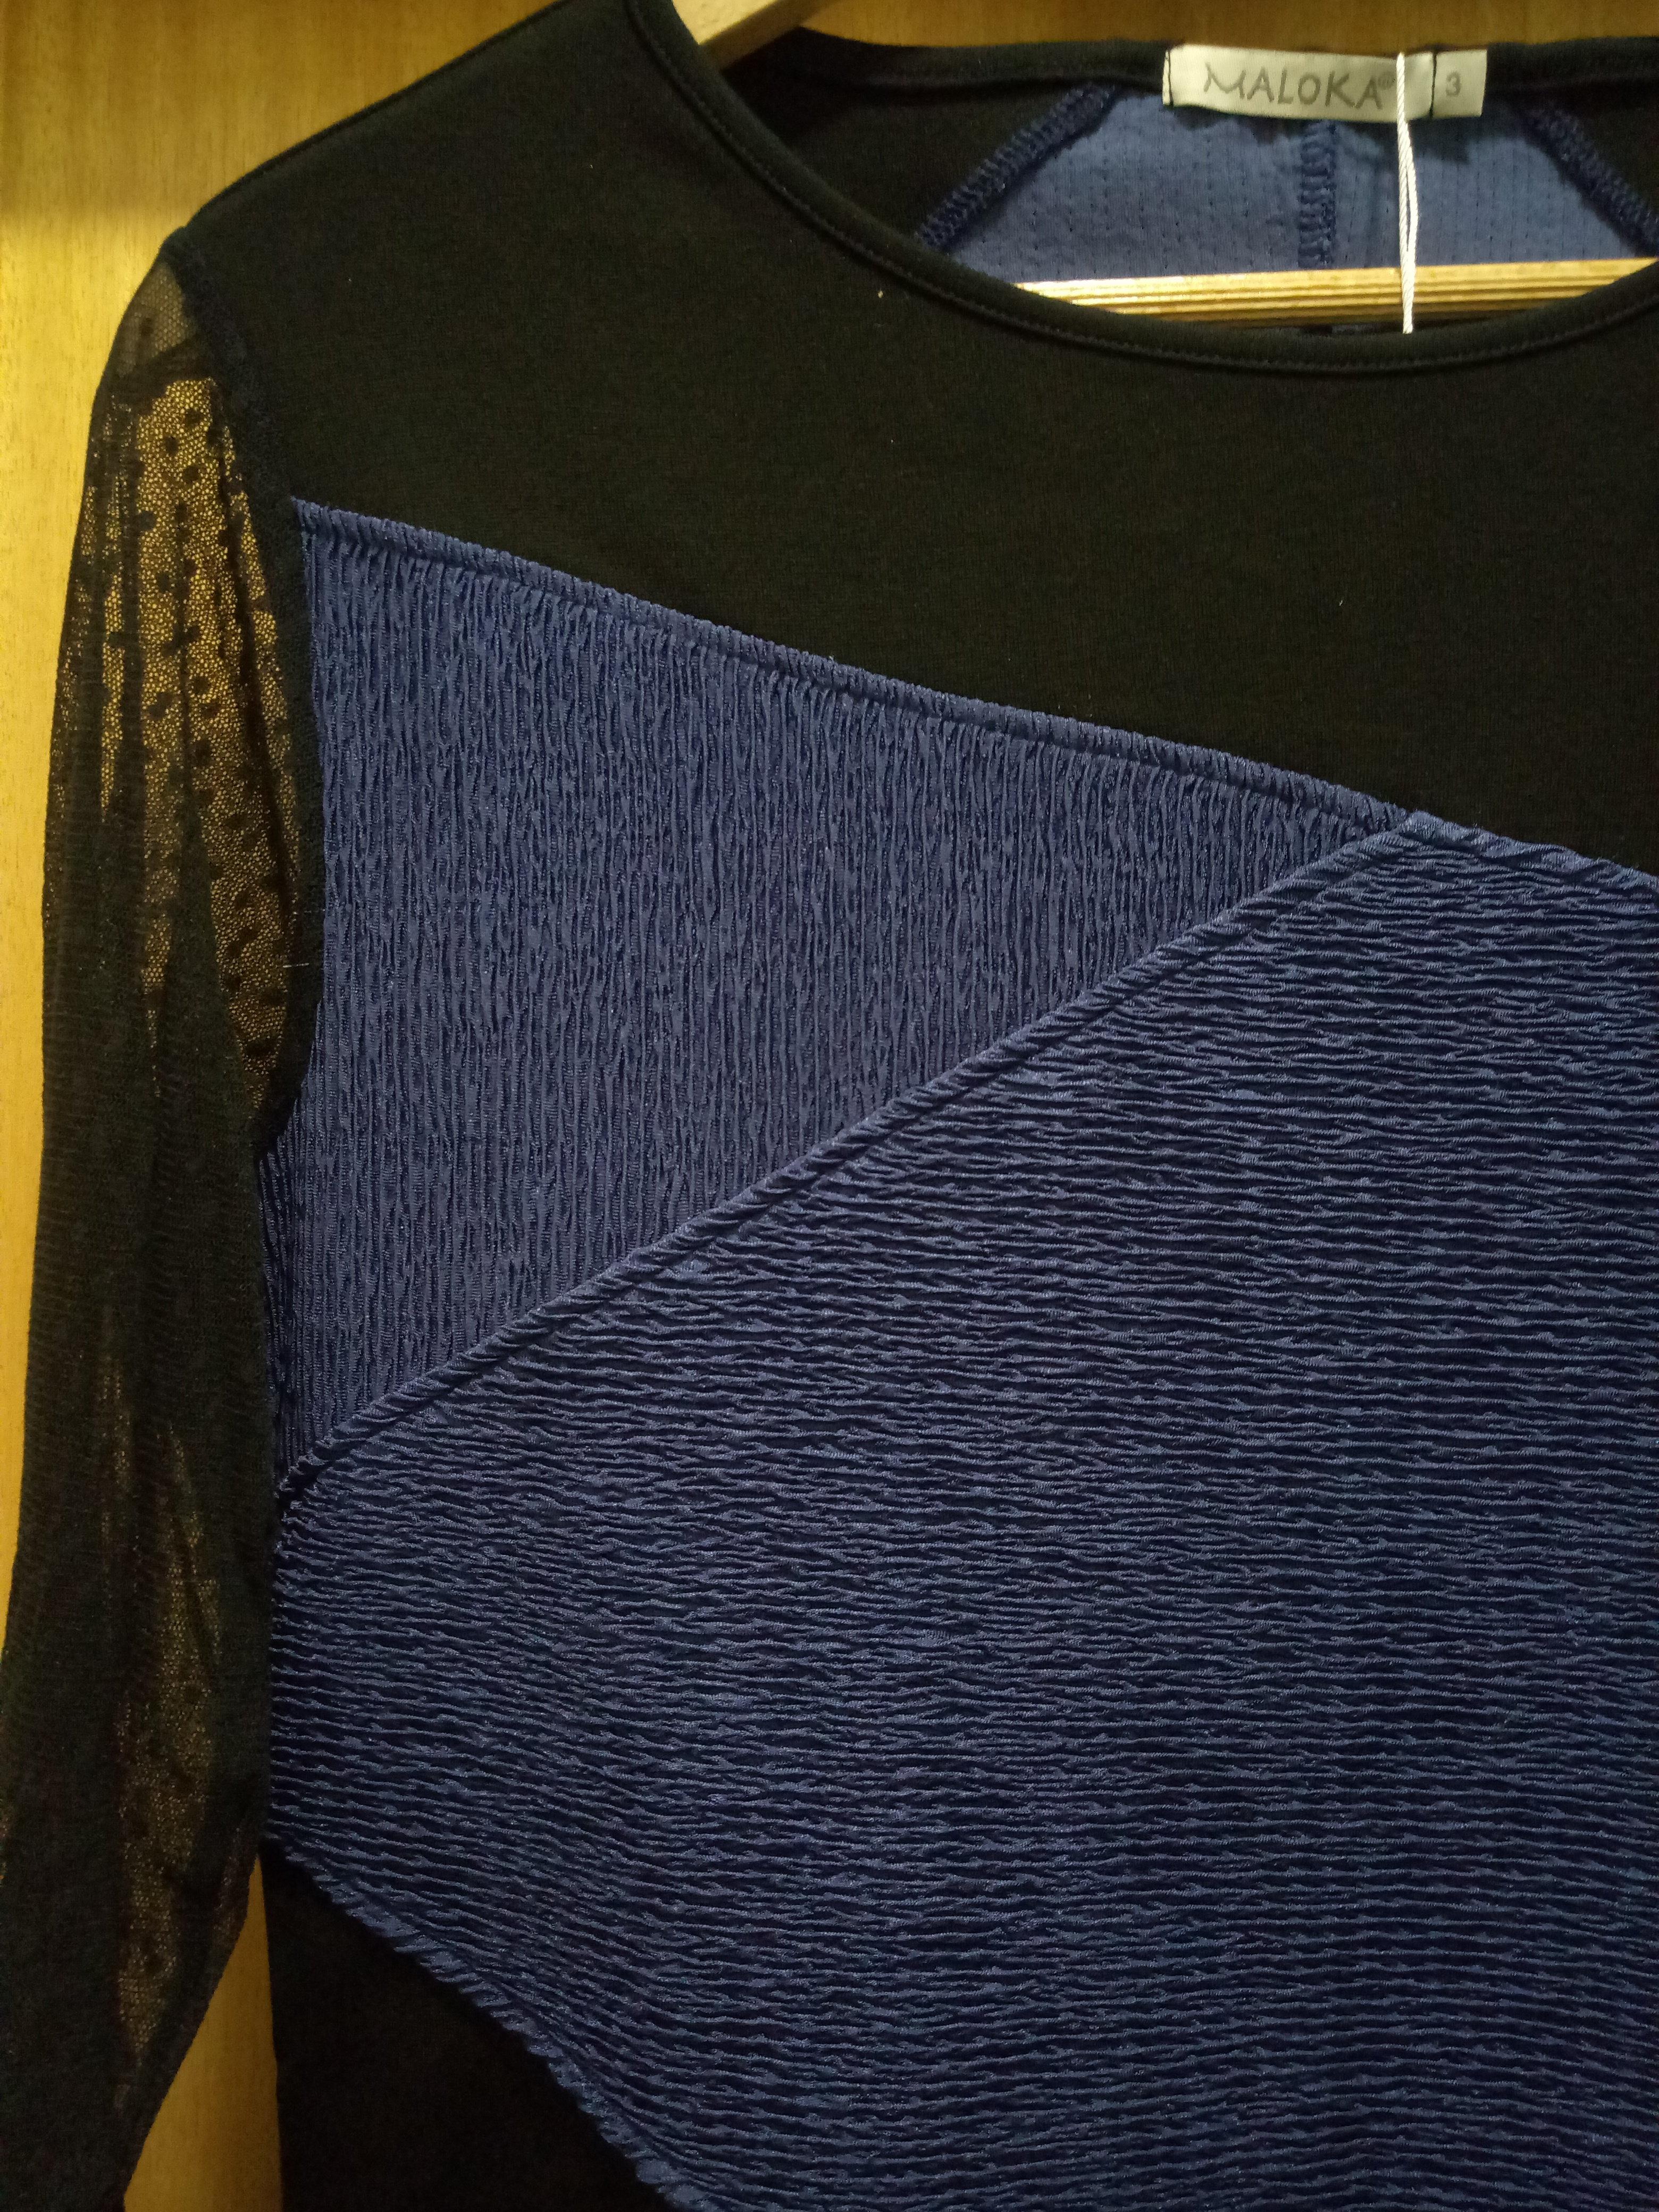 Maloka: Diamond Twist Scrunched Ribbon Dress